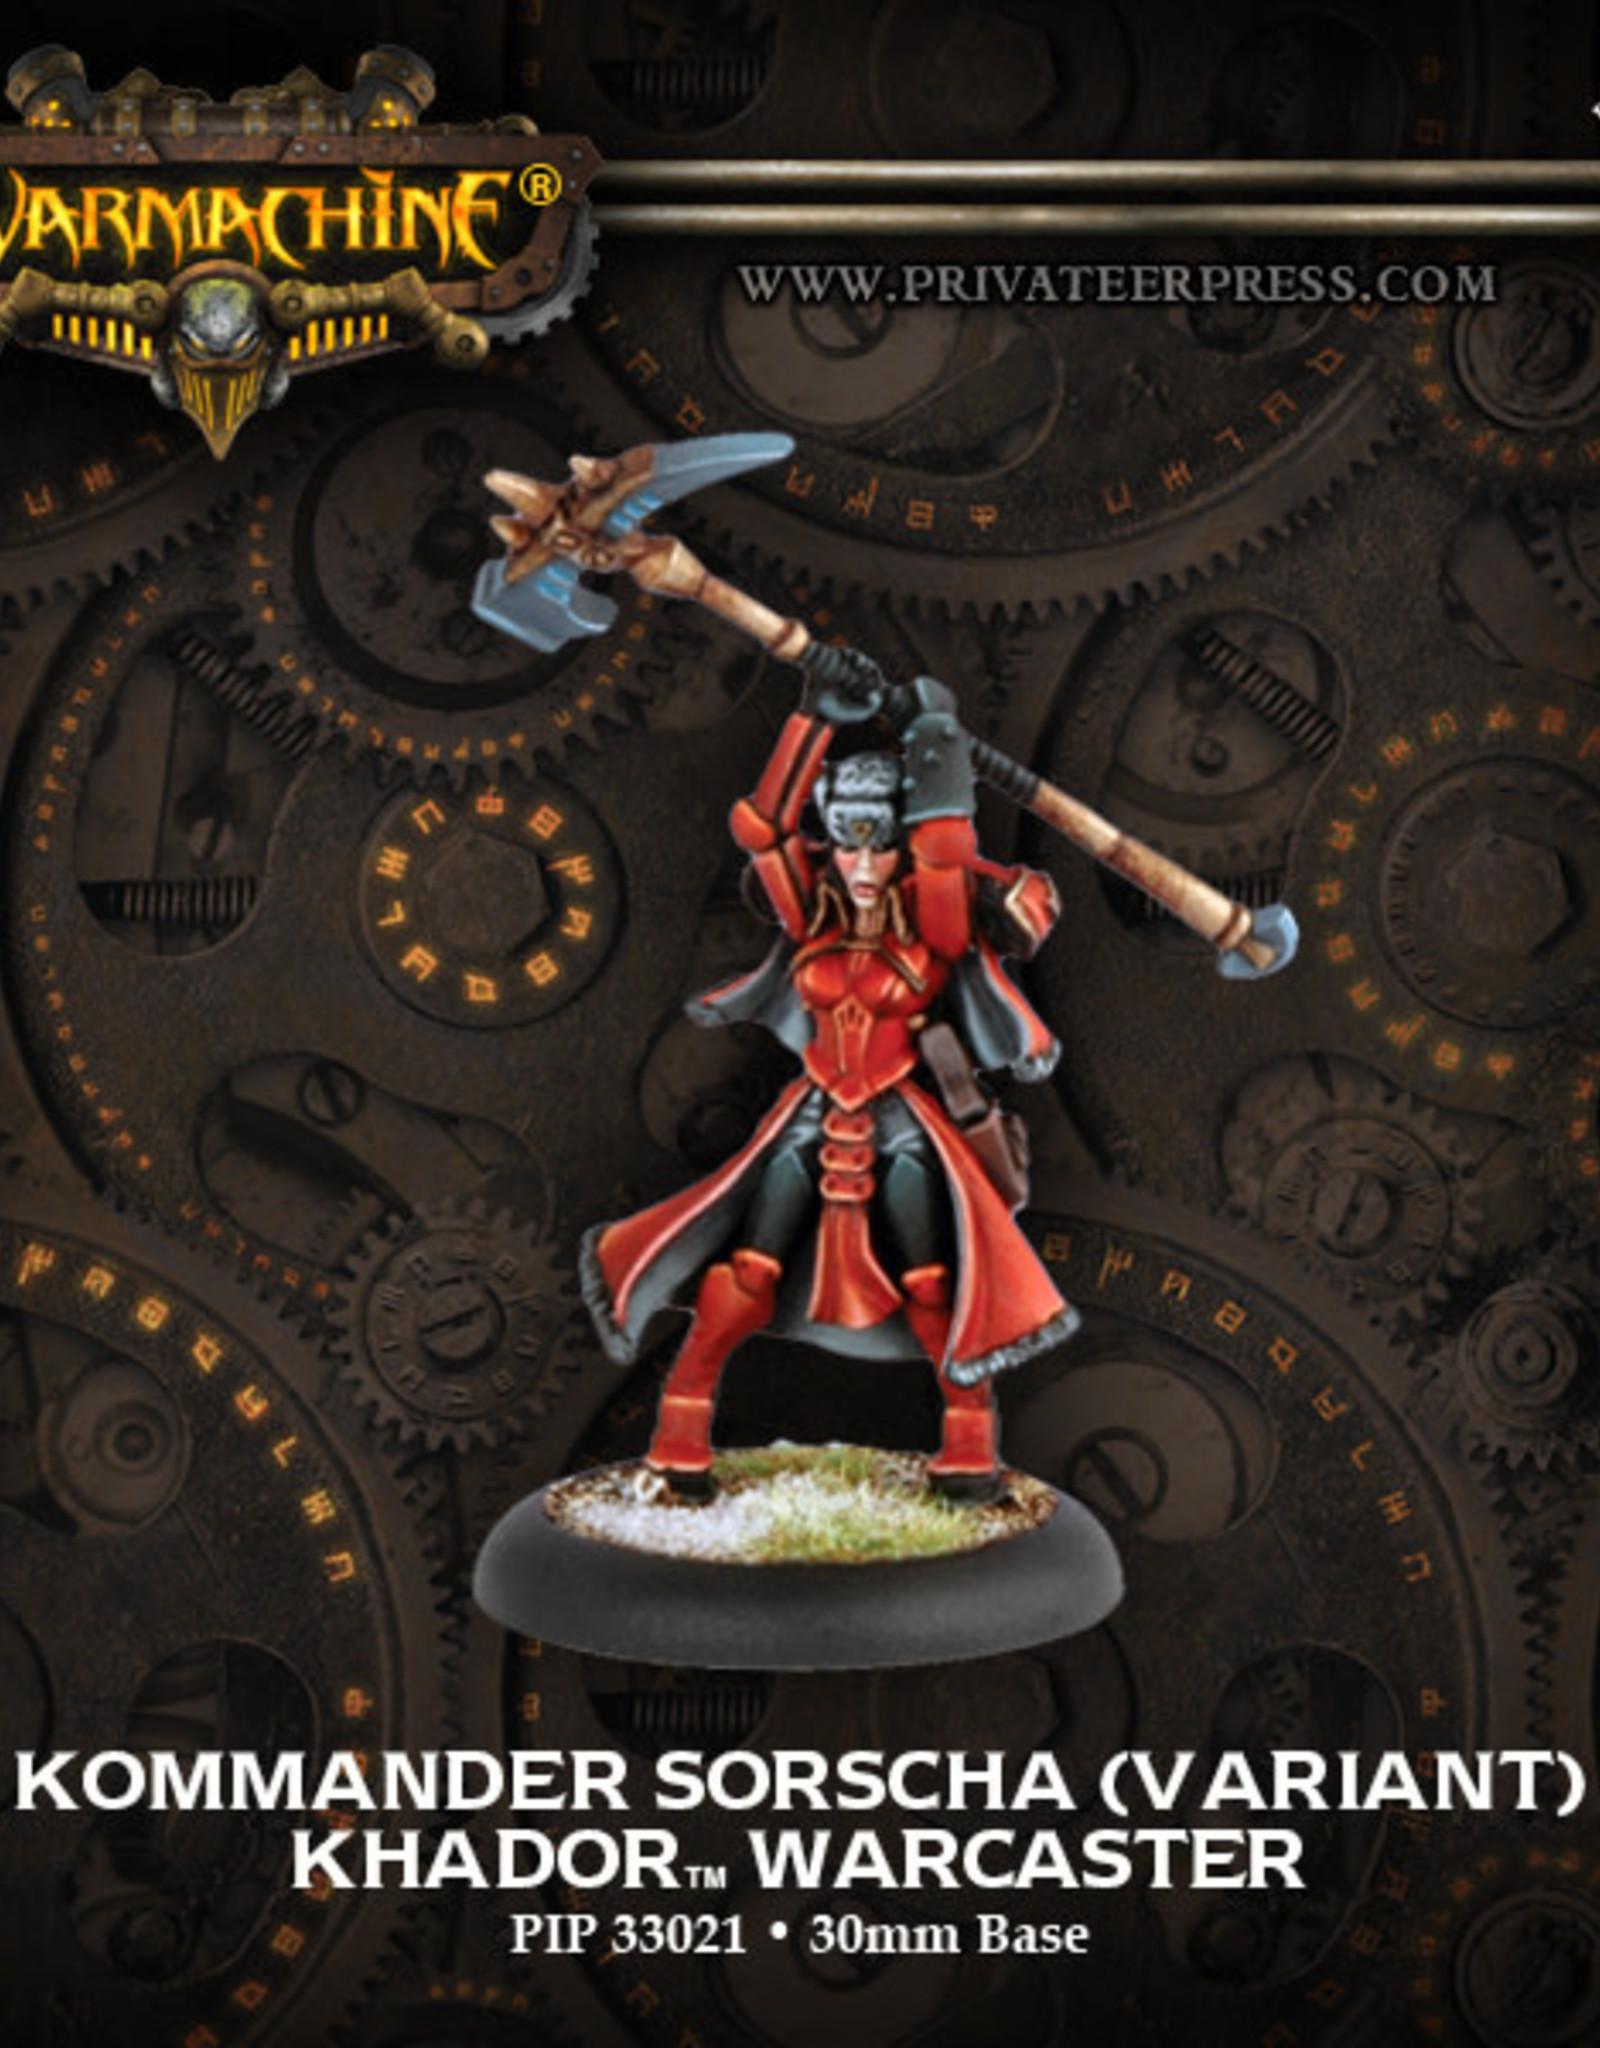 Warmachine Khador - Kommander Sorscha